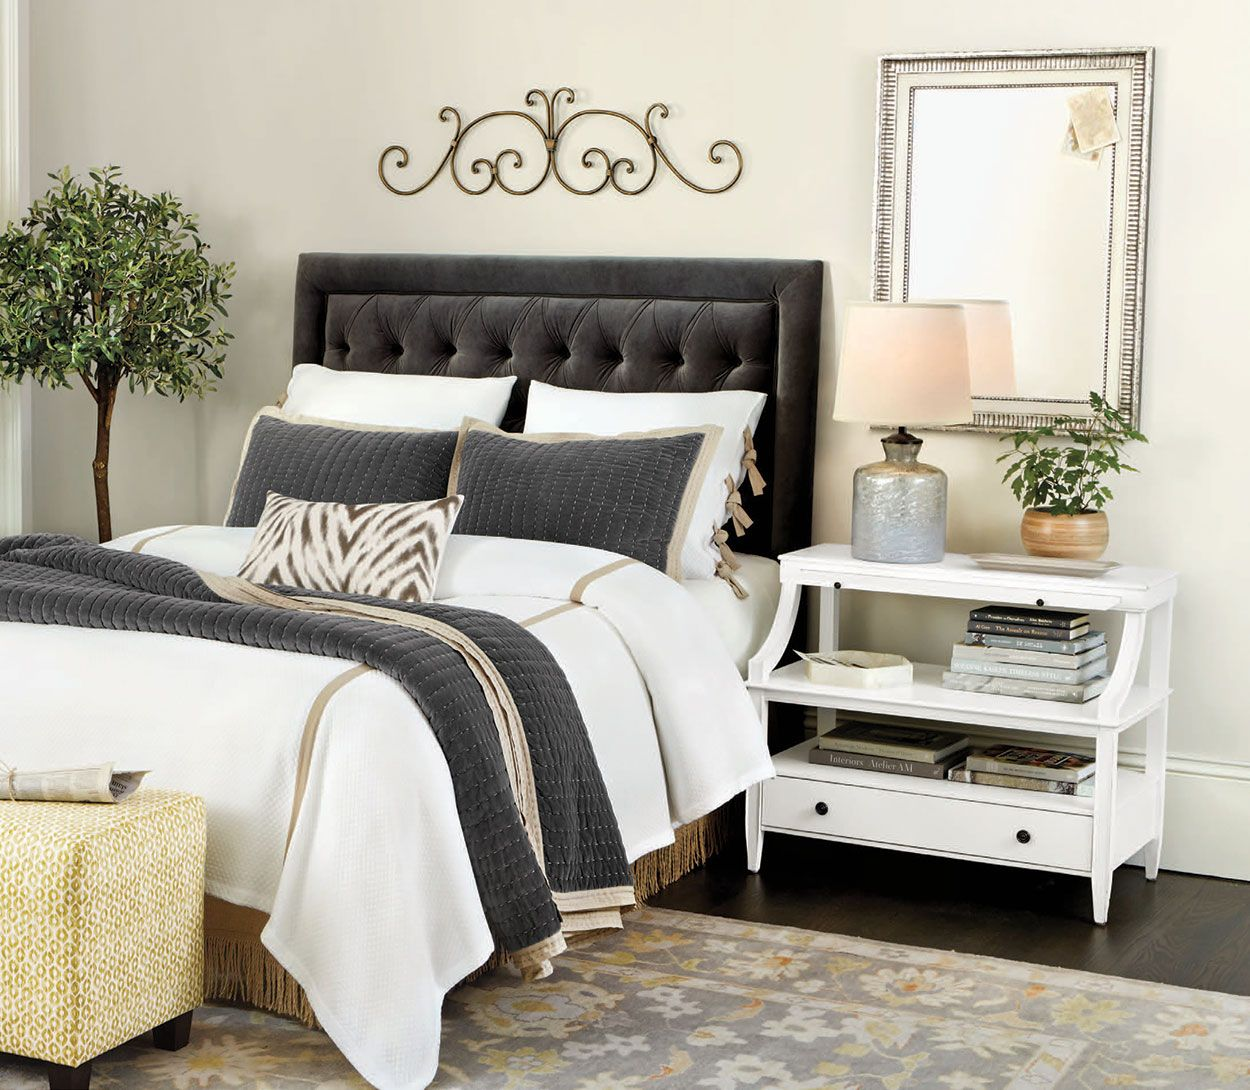 Beautiful Master Bedroom Decorating Ideas 43 I Like The: Bedroom Decor, Beautiful